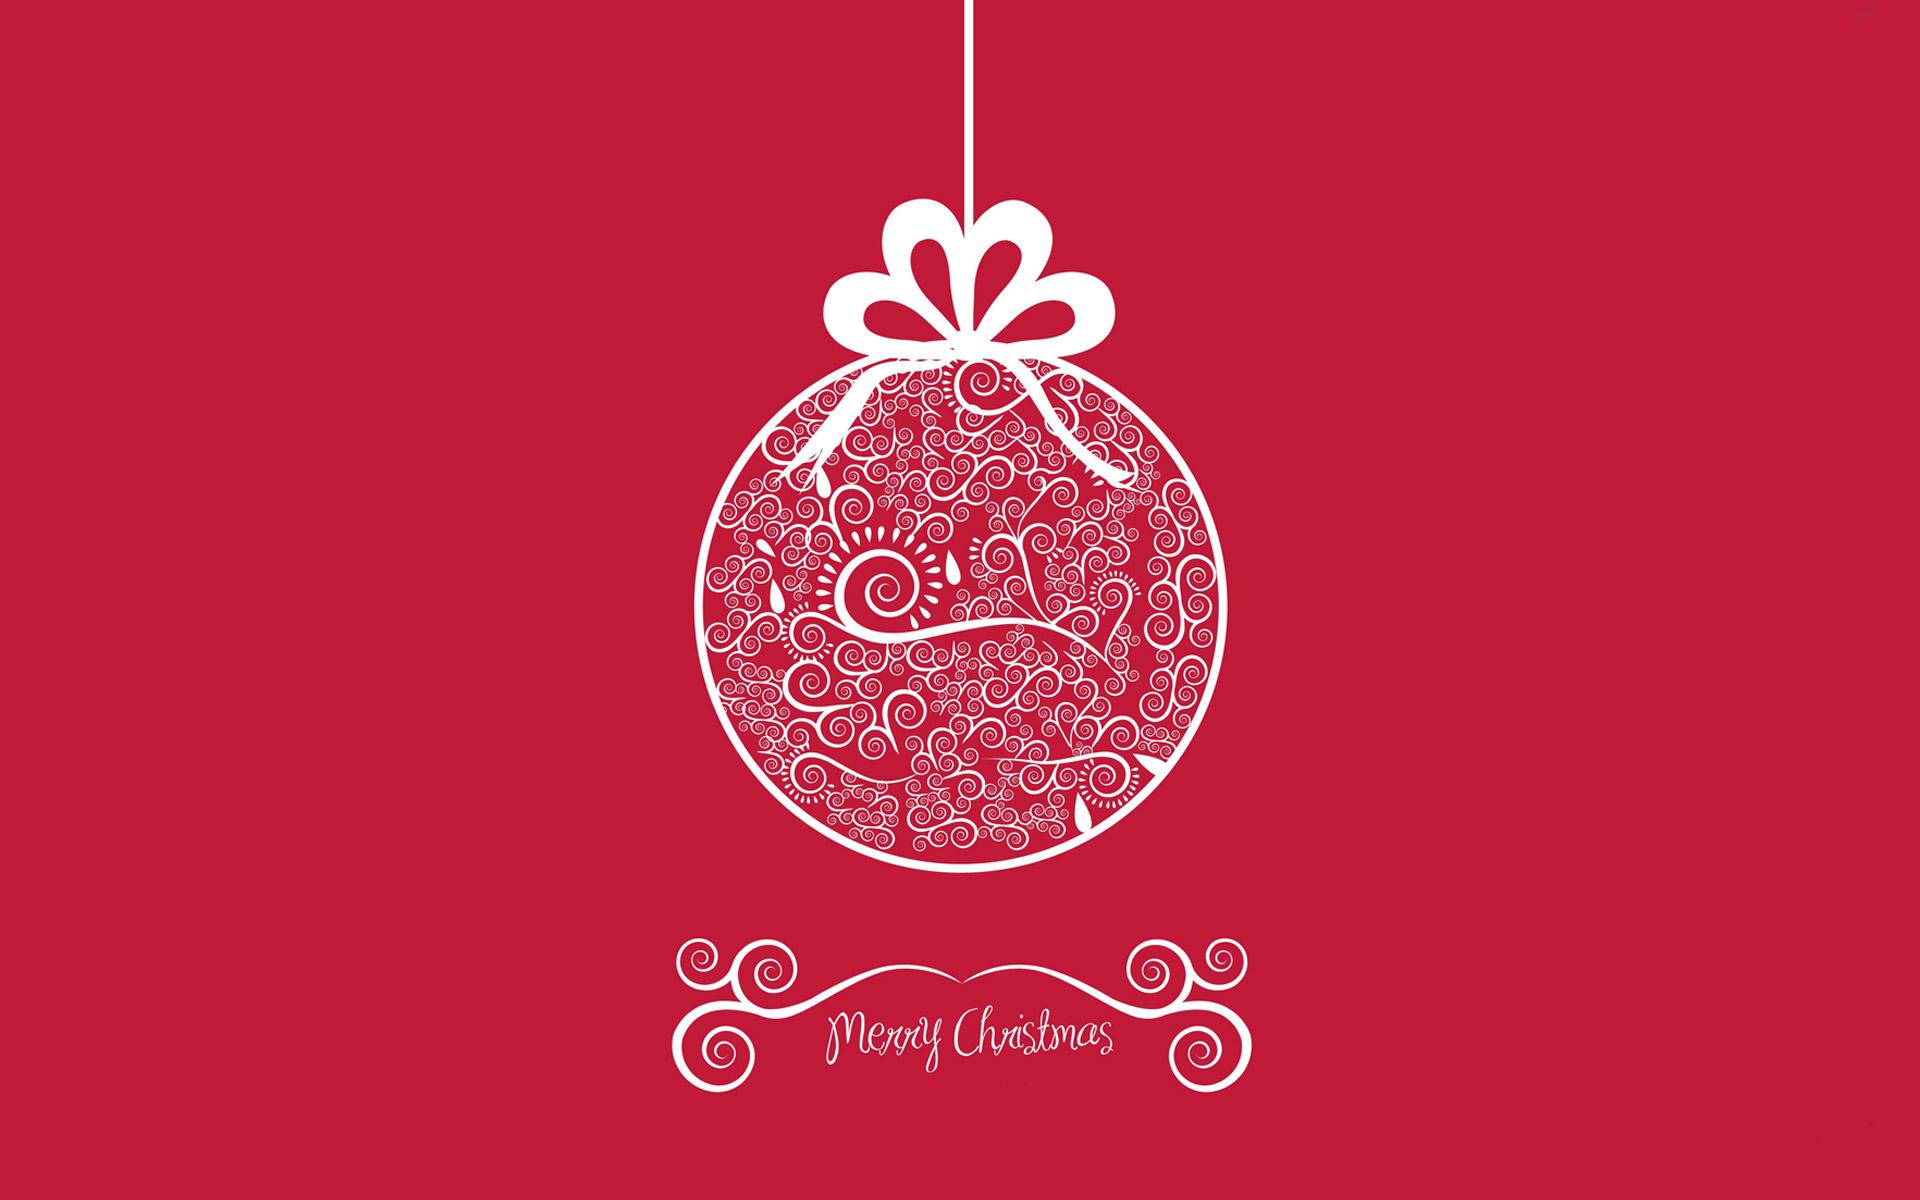 download-merry-christmas-wallpaper-3